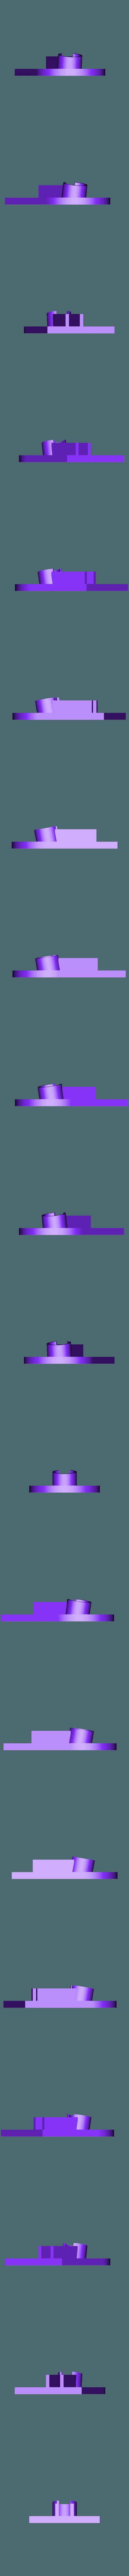 Reflector.stl Download STL file Shadow Lamp • 3D print model, MAyobe